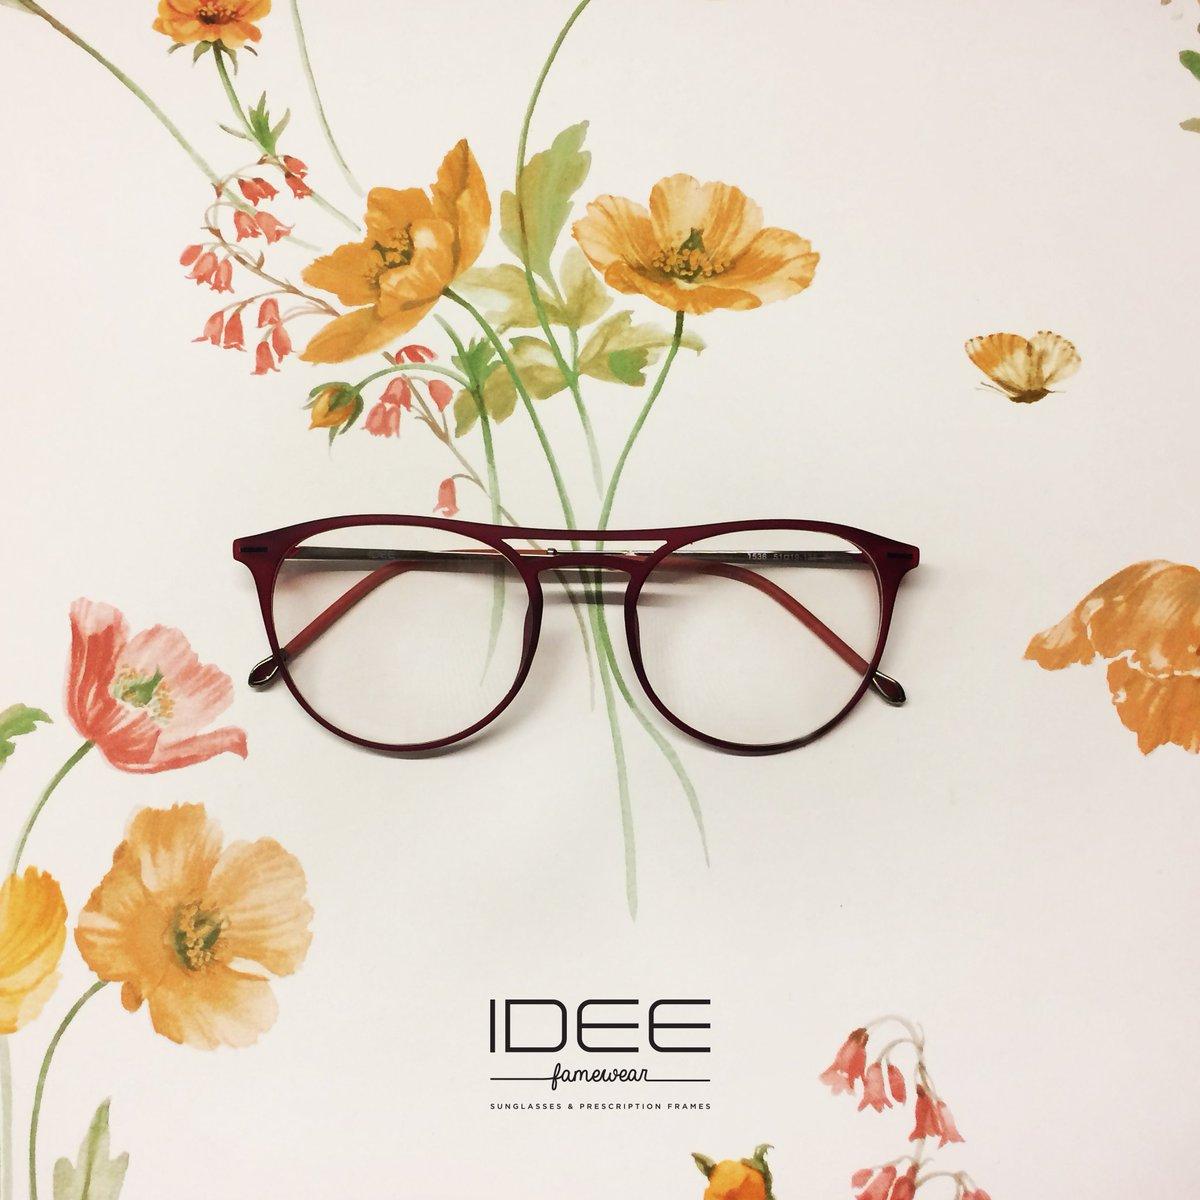 Let your style bloom with these trendy frames.  #IDEEeyewear#IDEEfamewear#Famewear#IDEE <br>http://pic.twitter.com/IPvlKIvTrN